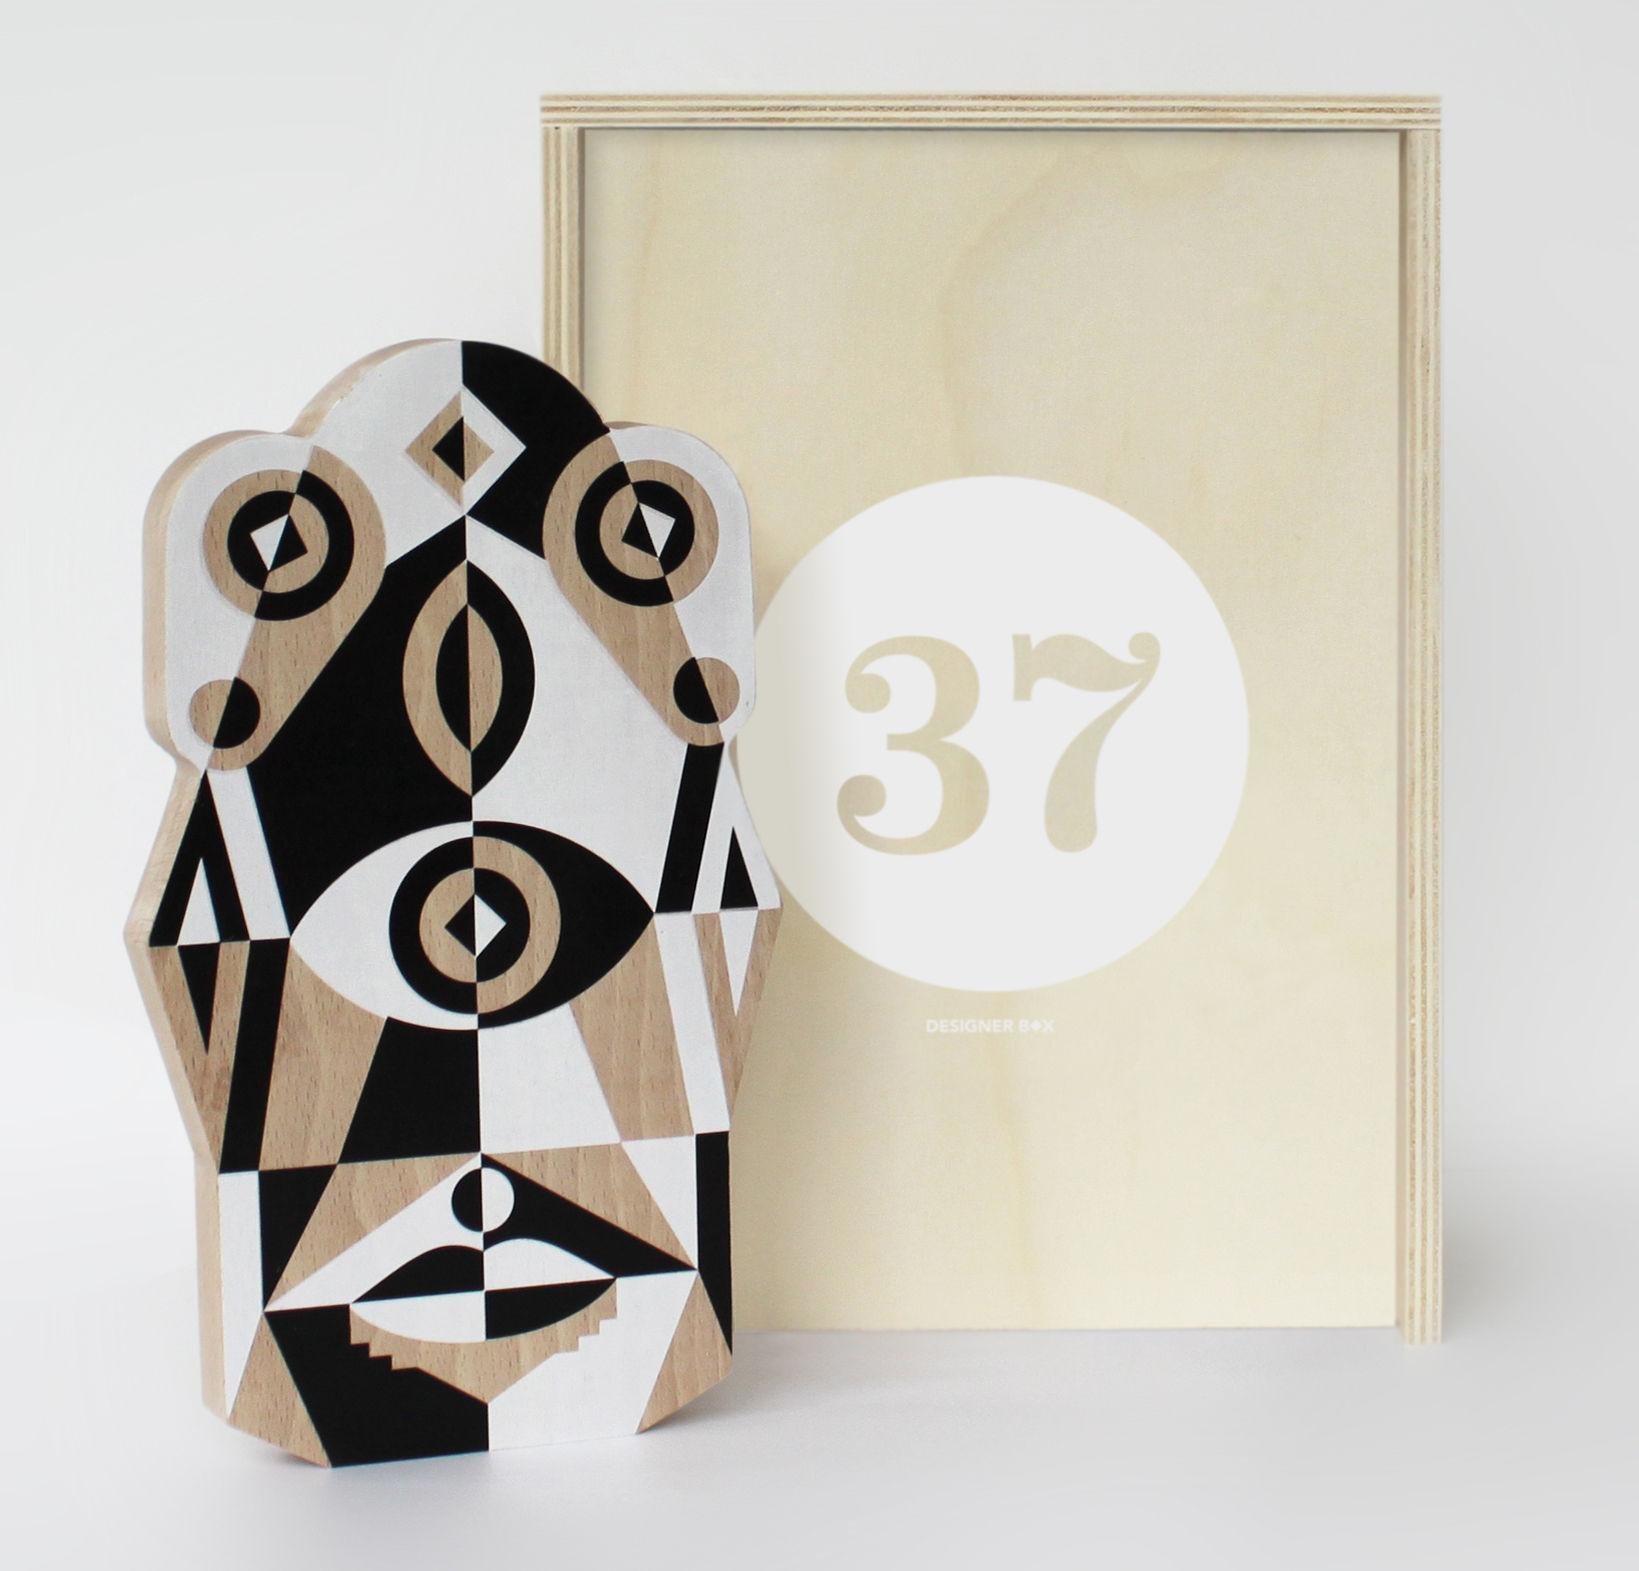 Kitchenware - Kitchen Equipment - Designerbox#37 Box - Totem chopboard - Leslie David by Designerbox - Wood / Black & White - Silkscreen beech